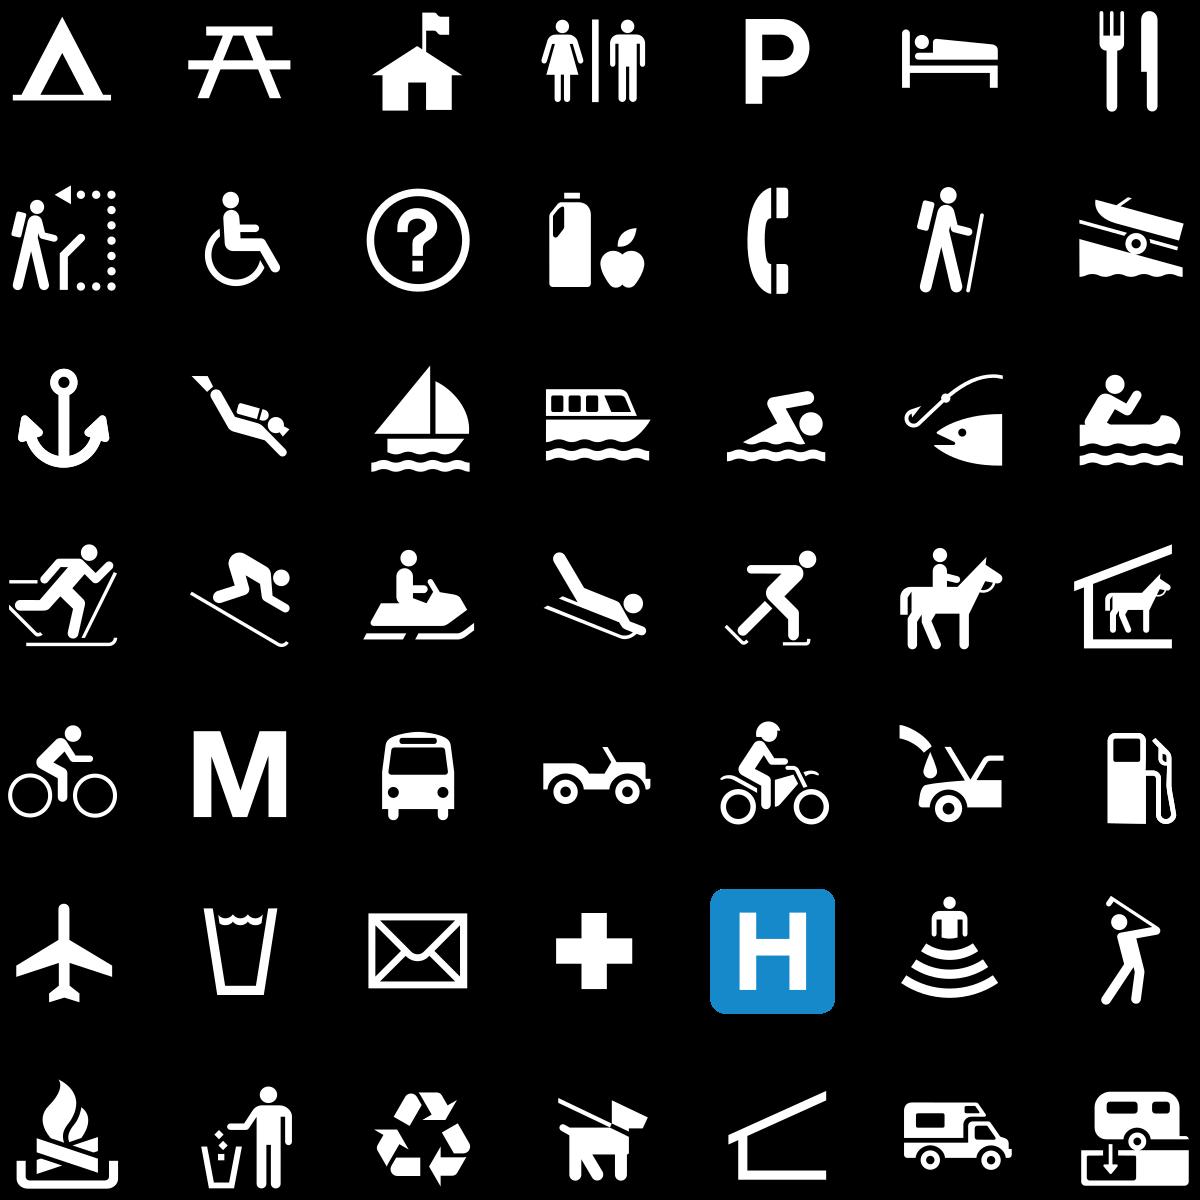 Graphic design wikipedia . Communication clipart communication symbol